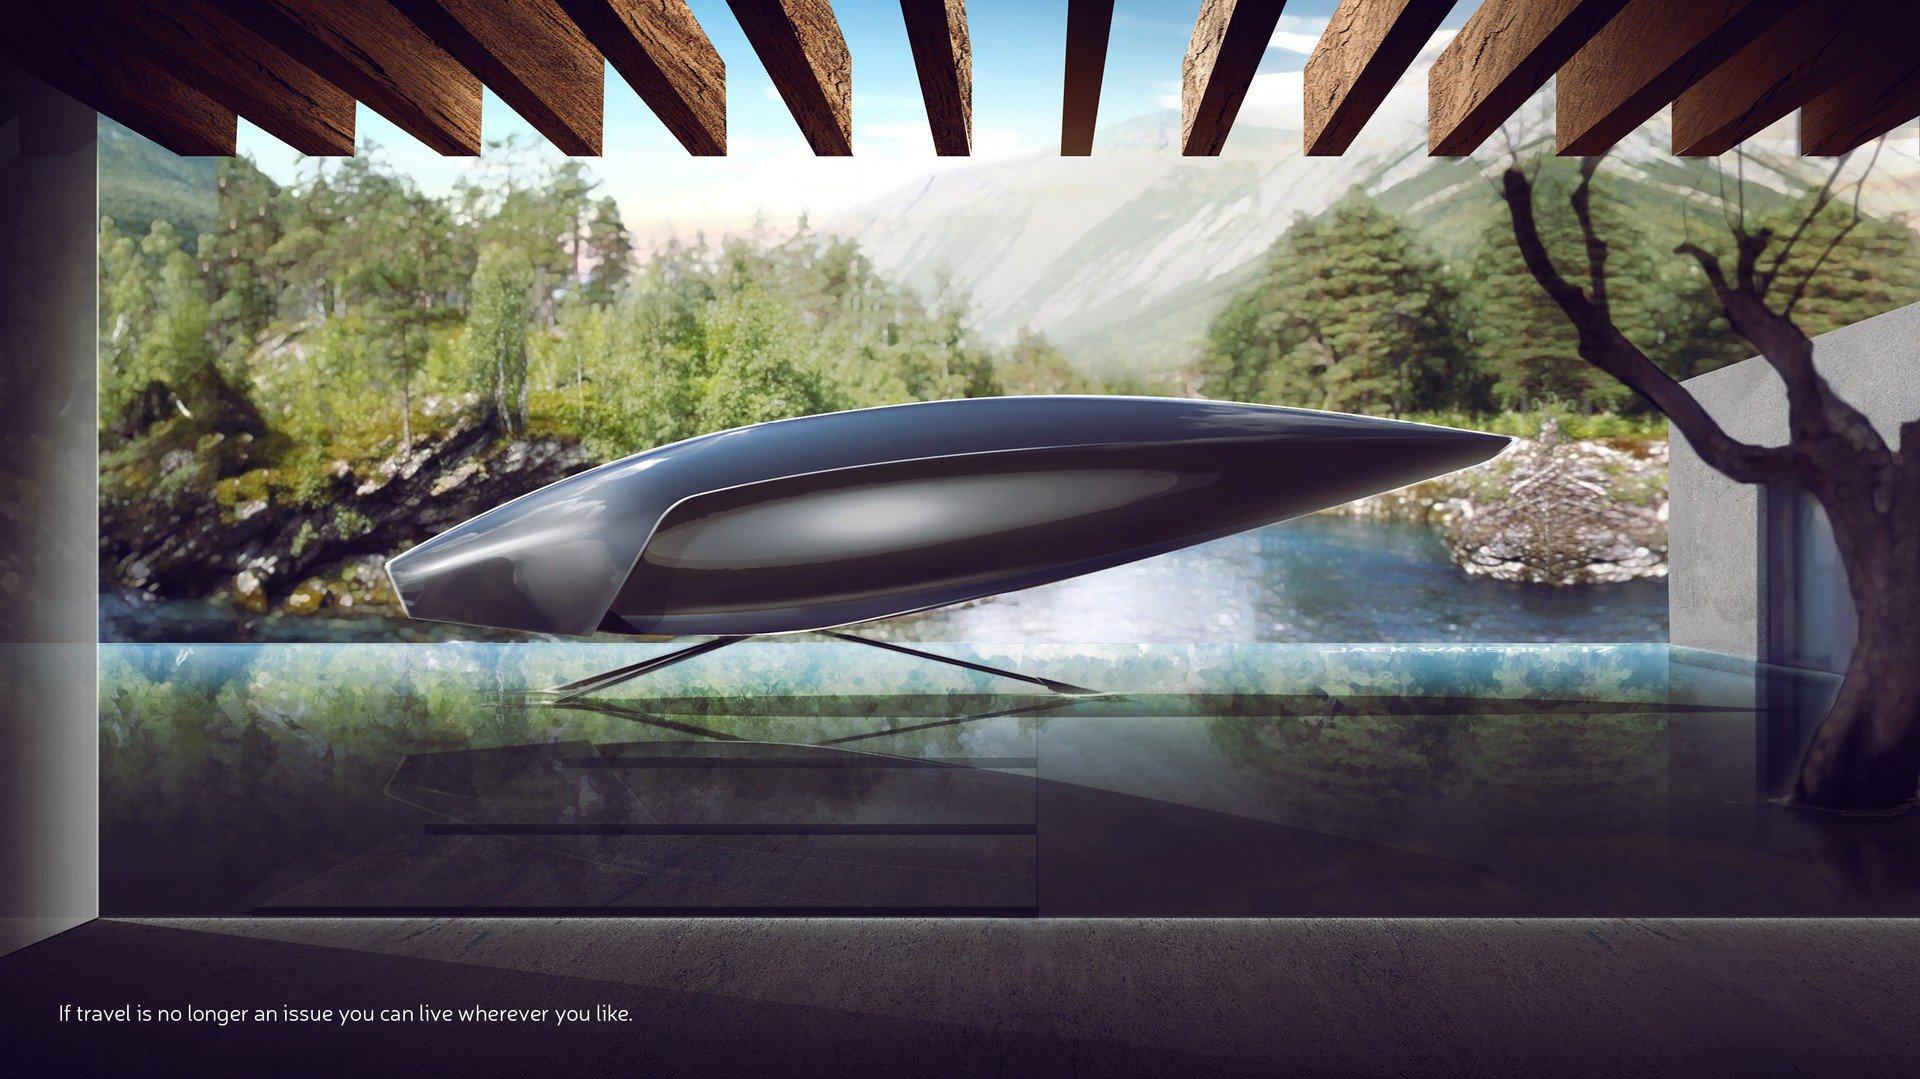 Bentley Future Cars 2050 (3)